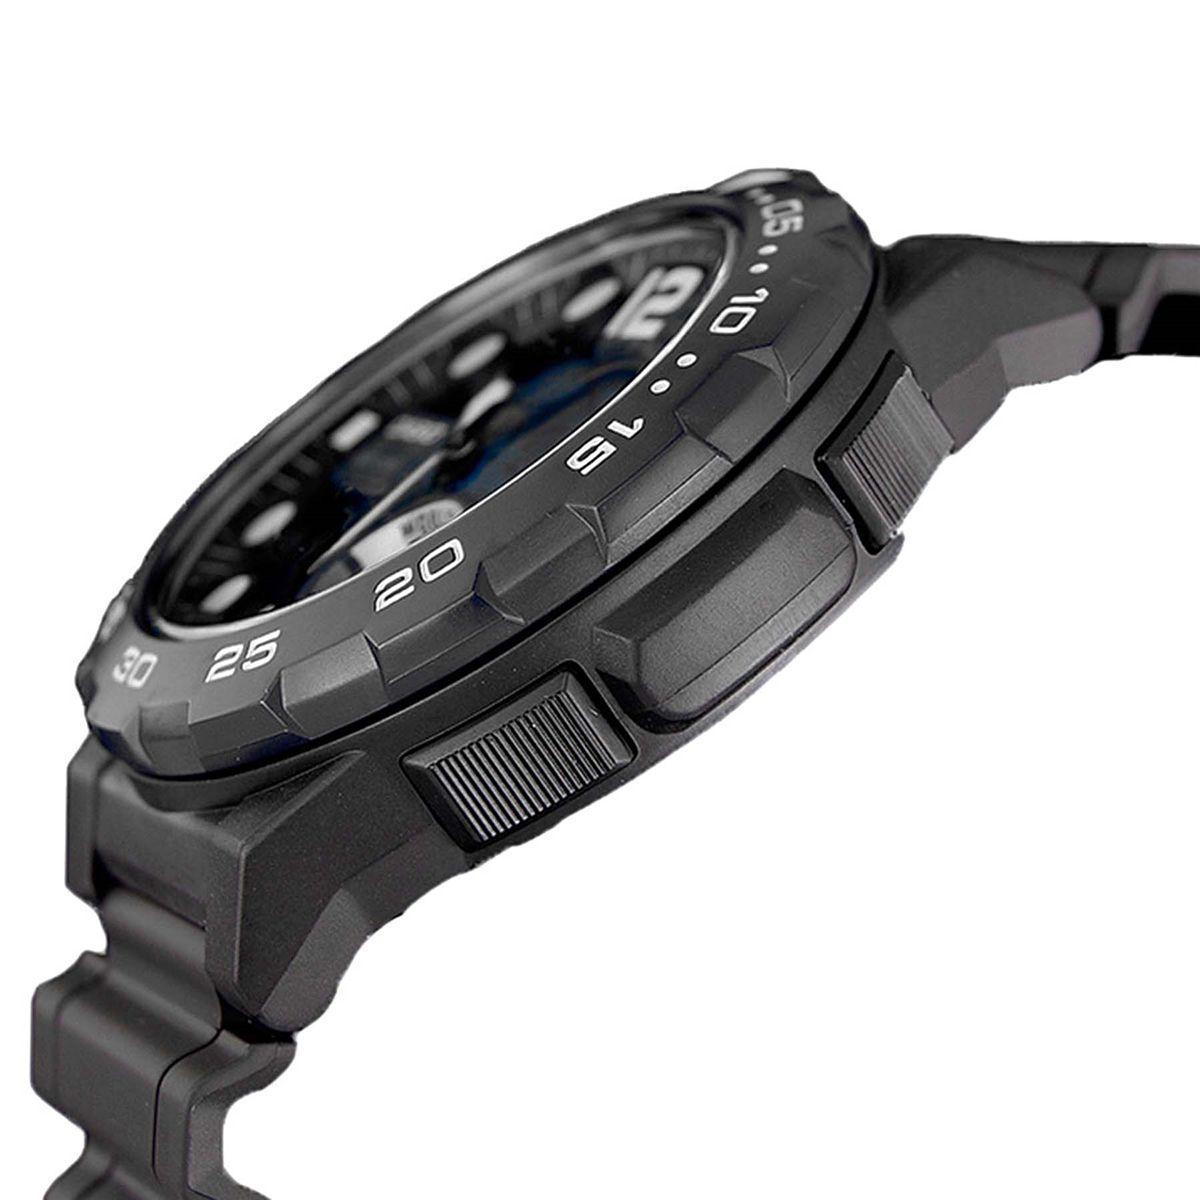 51fdec93532 Relógio Casio Standard Digital Masculino AEQ-100W-1A - Relógio ...